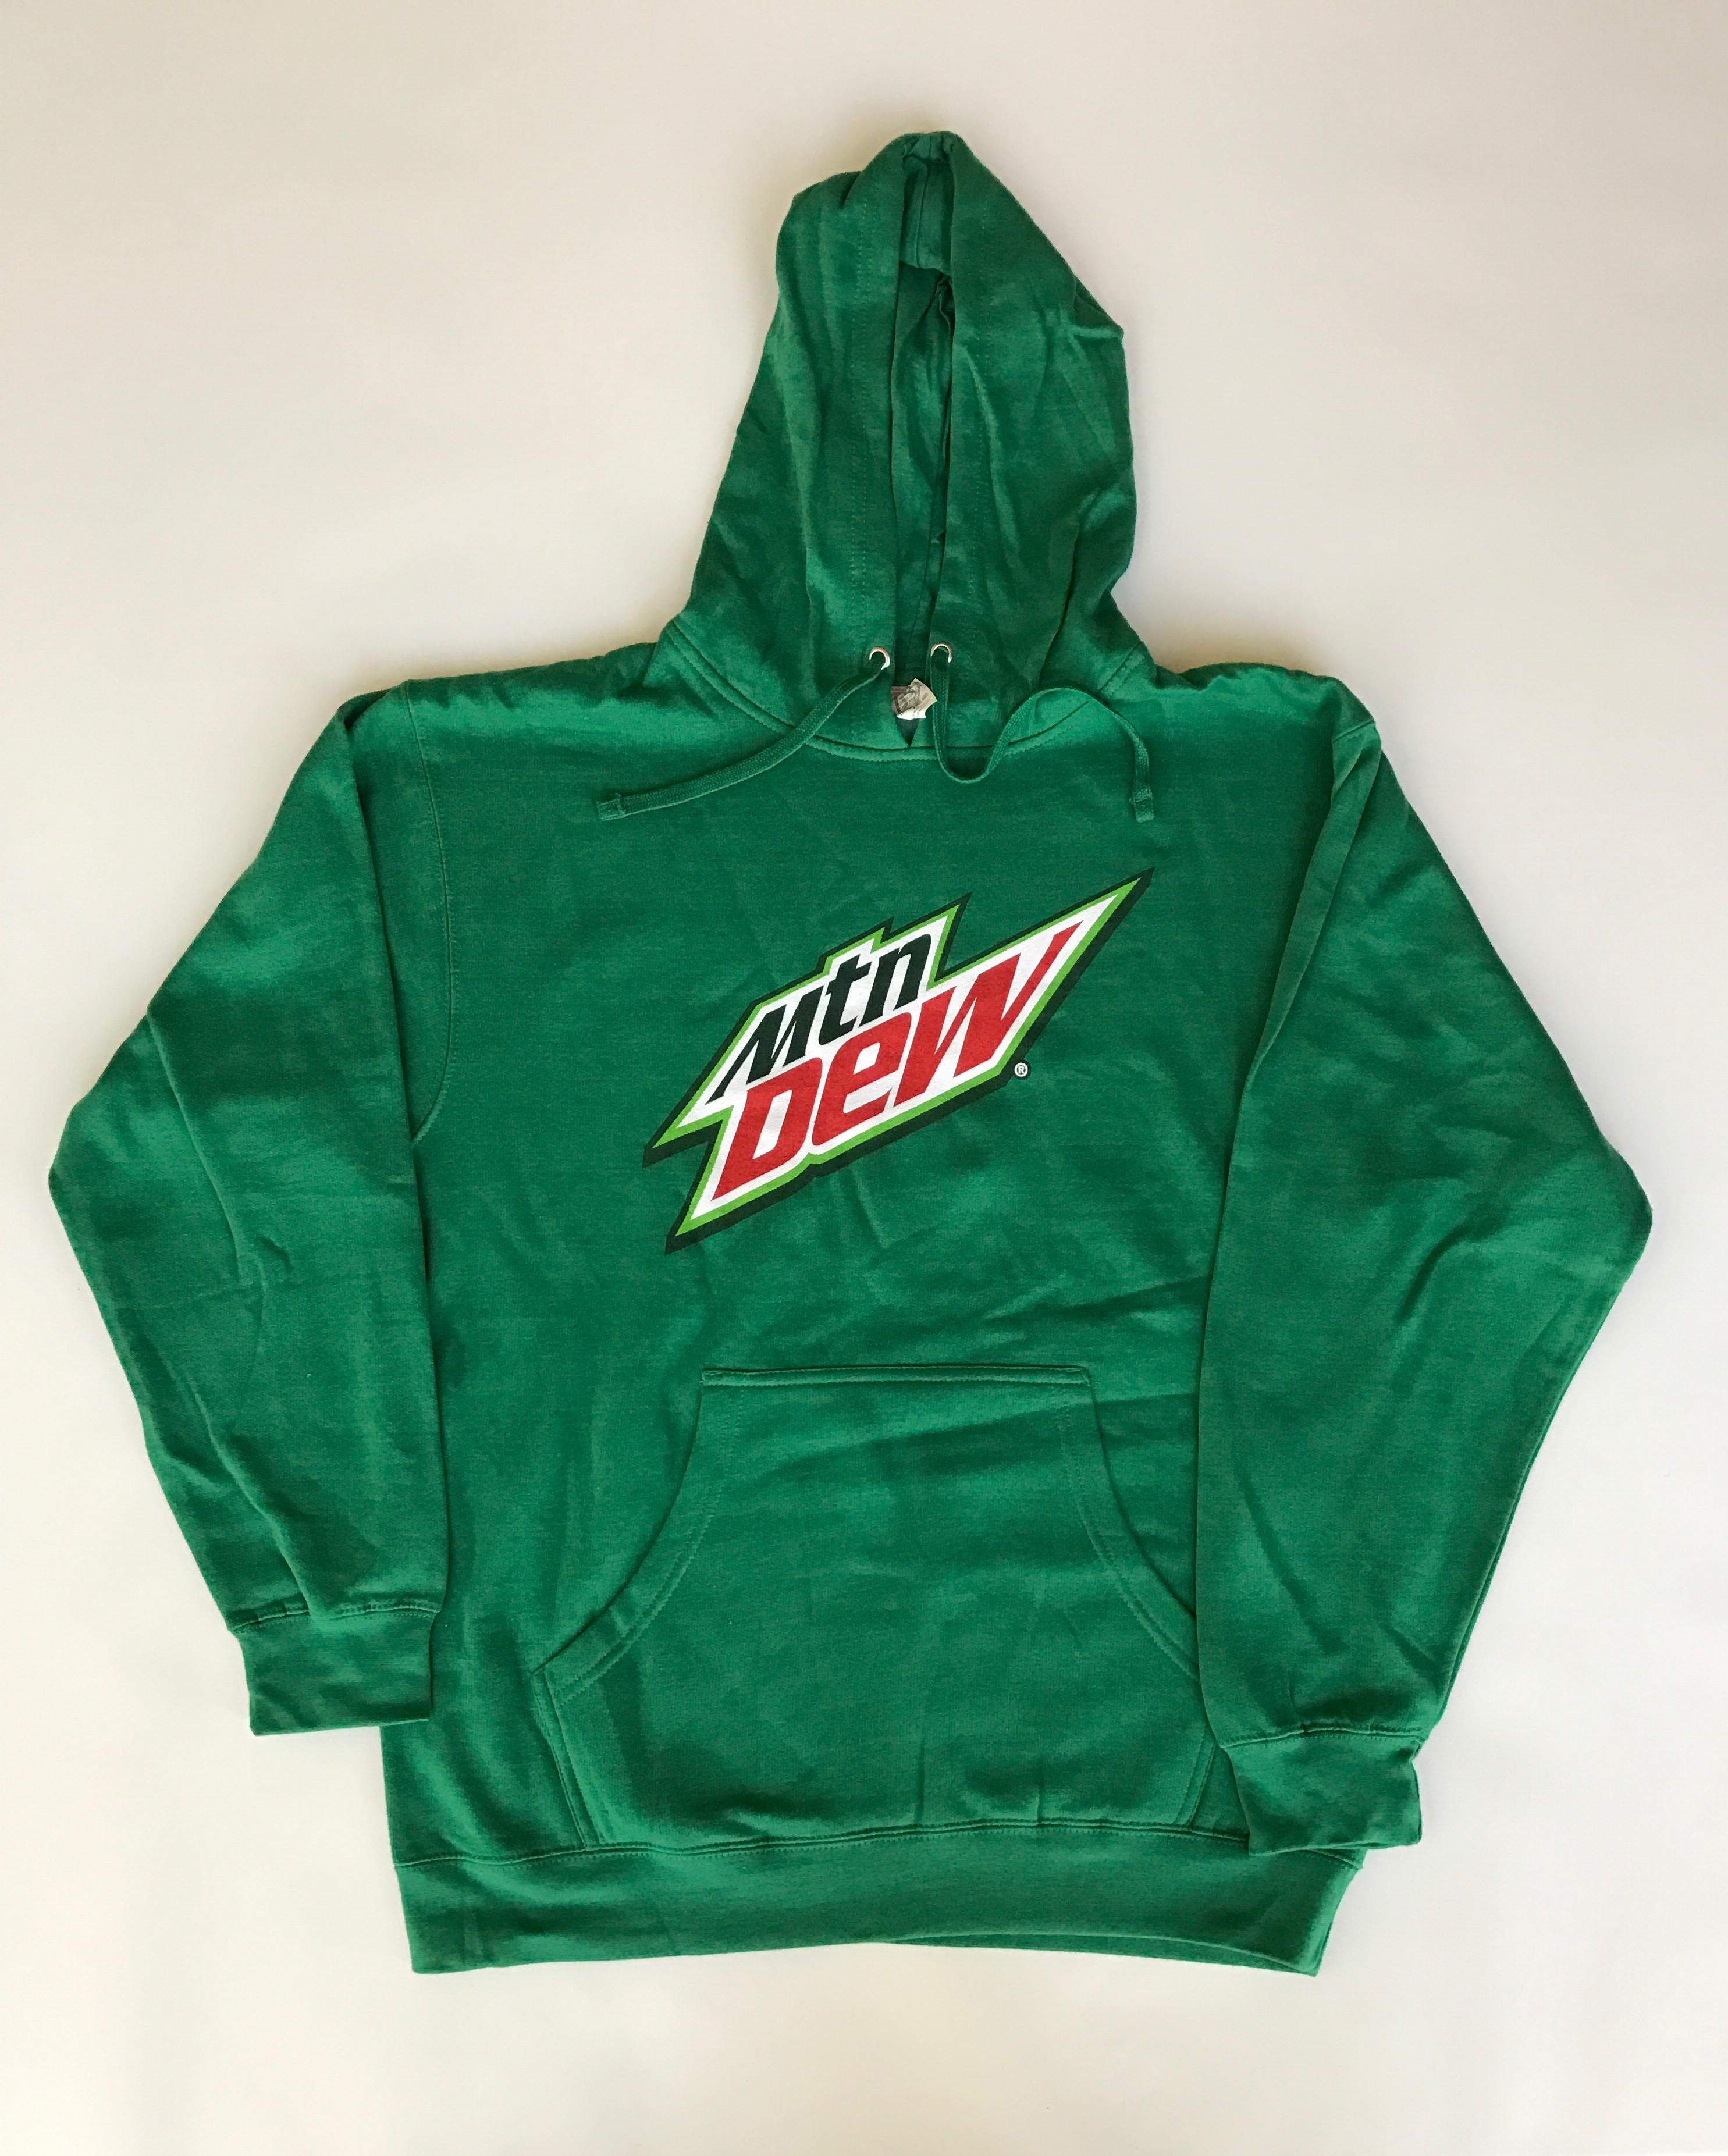 Pepsi hoodies